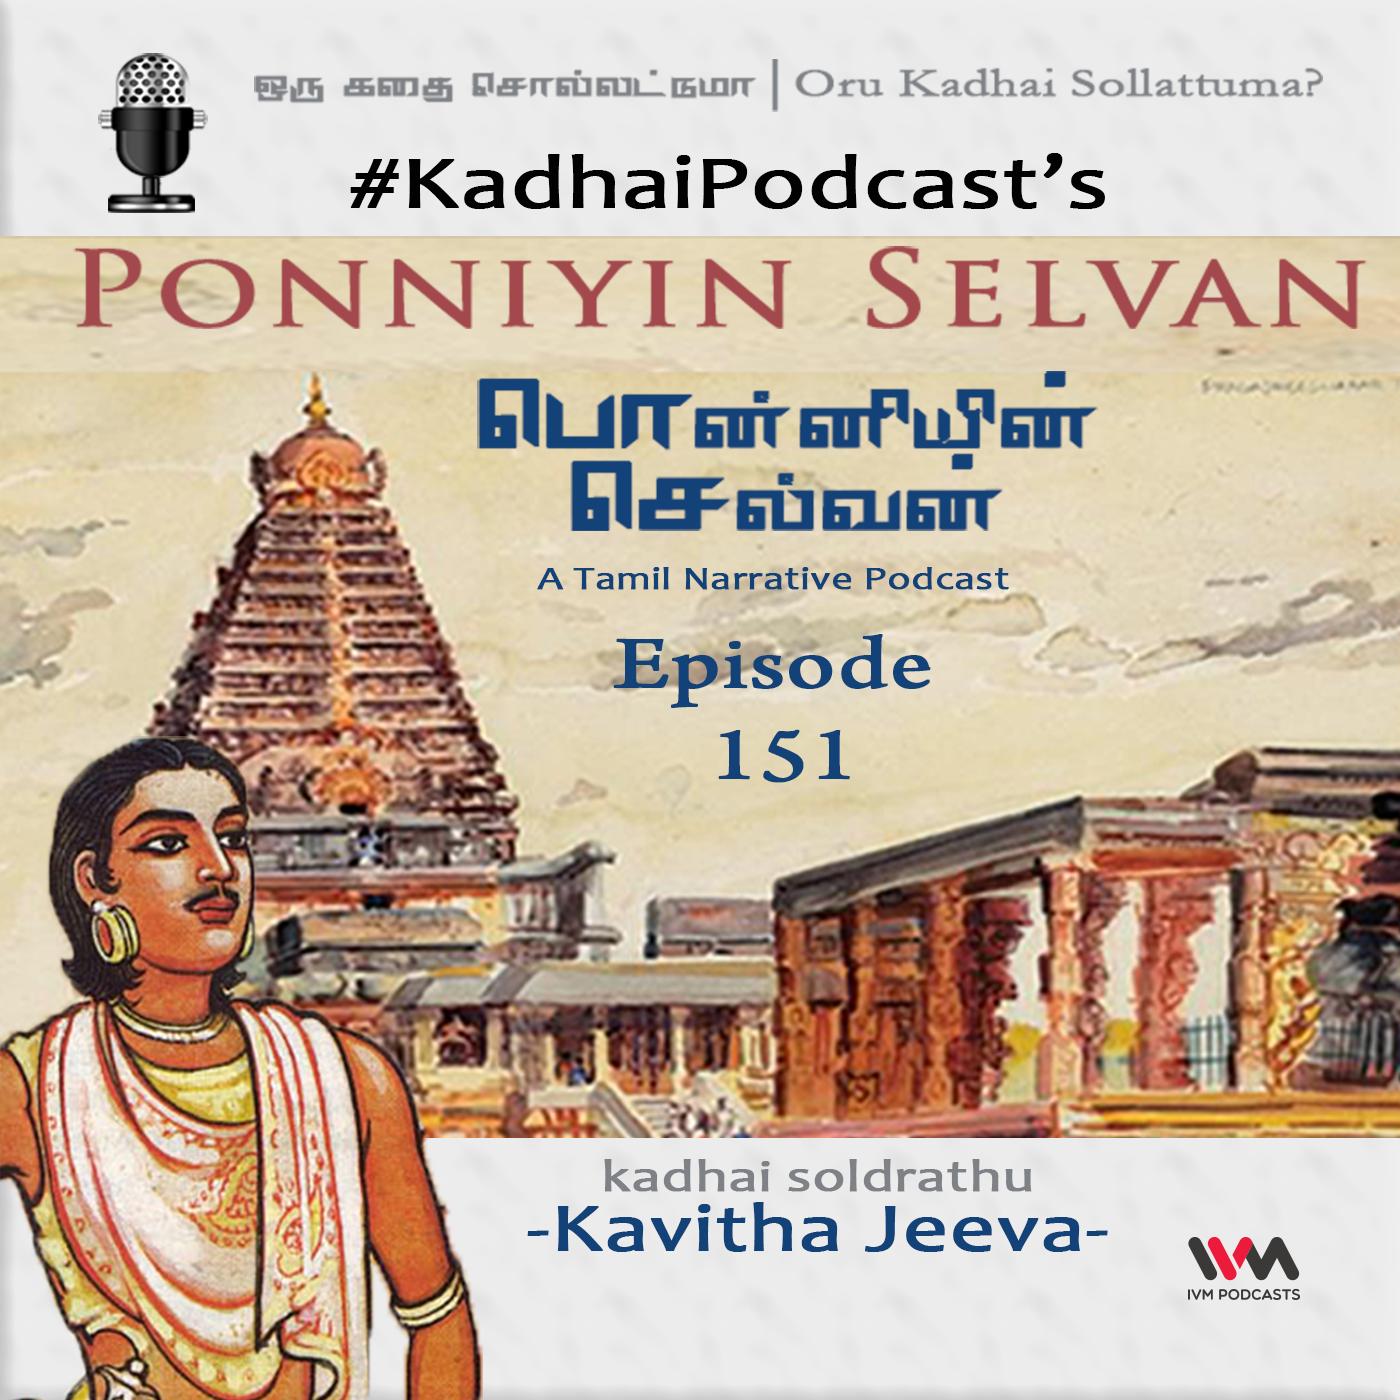 KadhaiPodcast's Ponniyin Selvan - Episode # 151